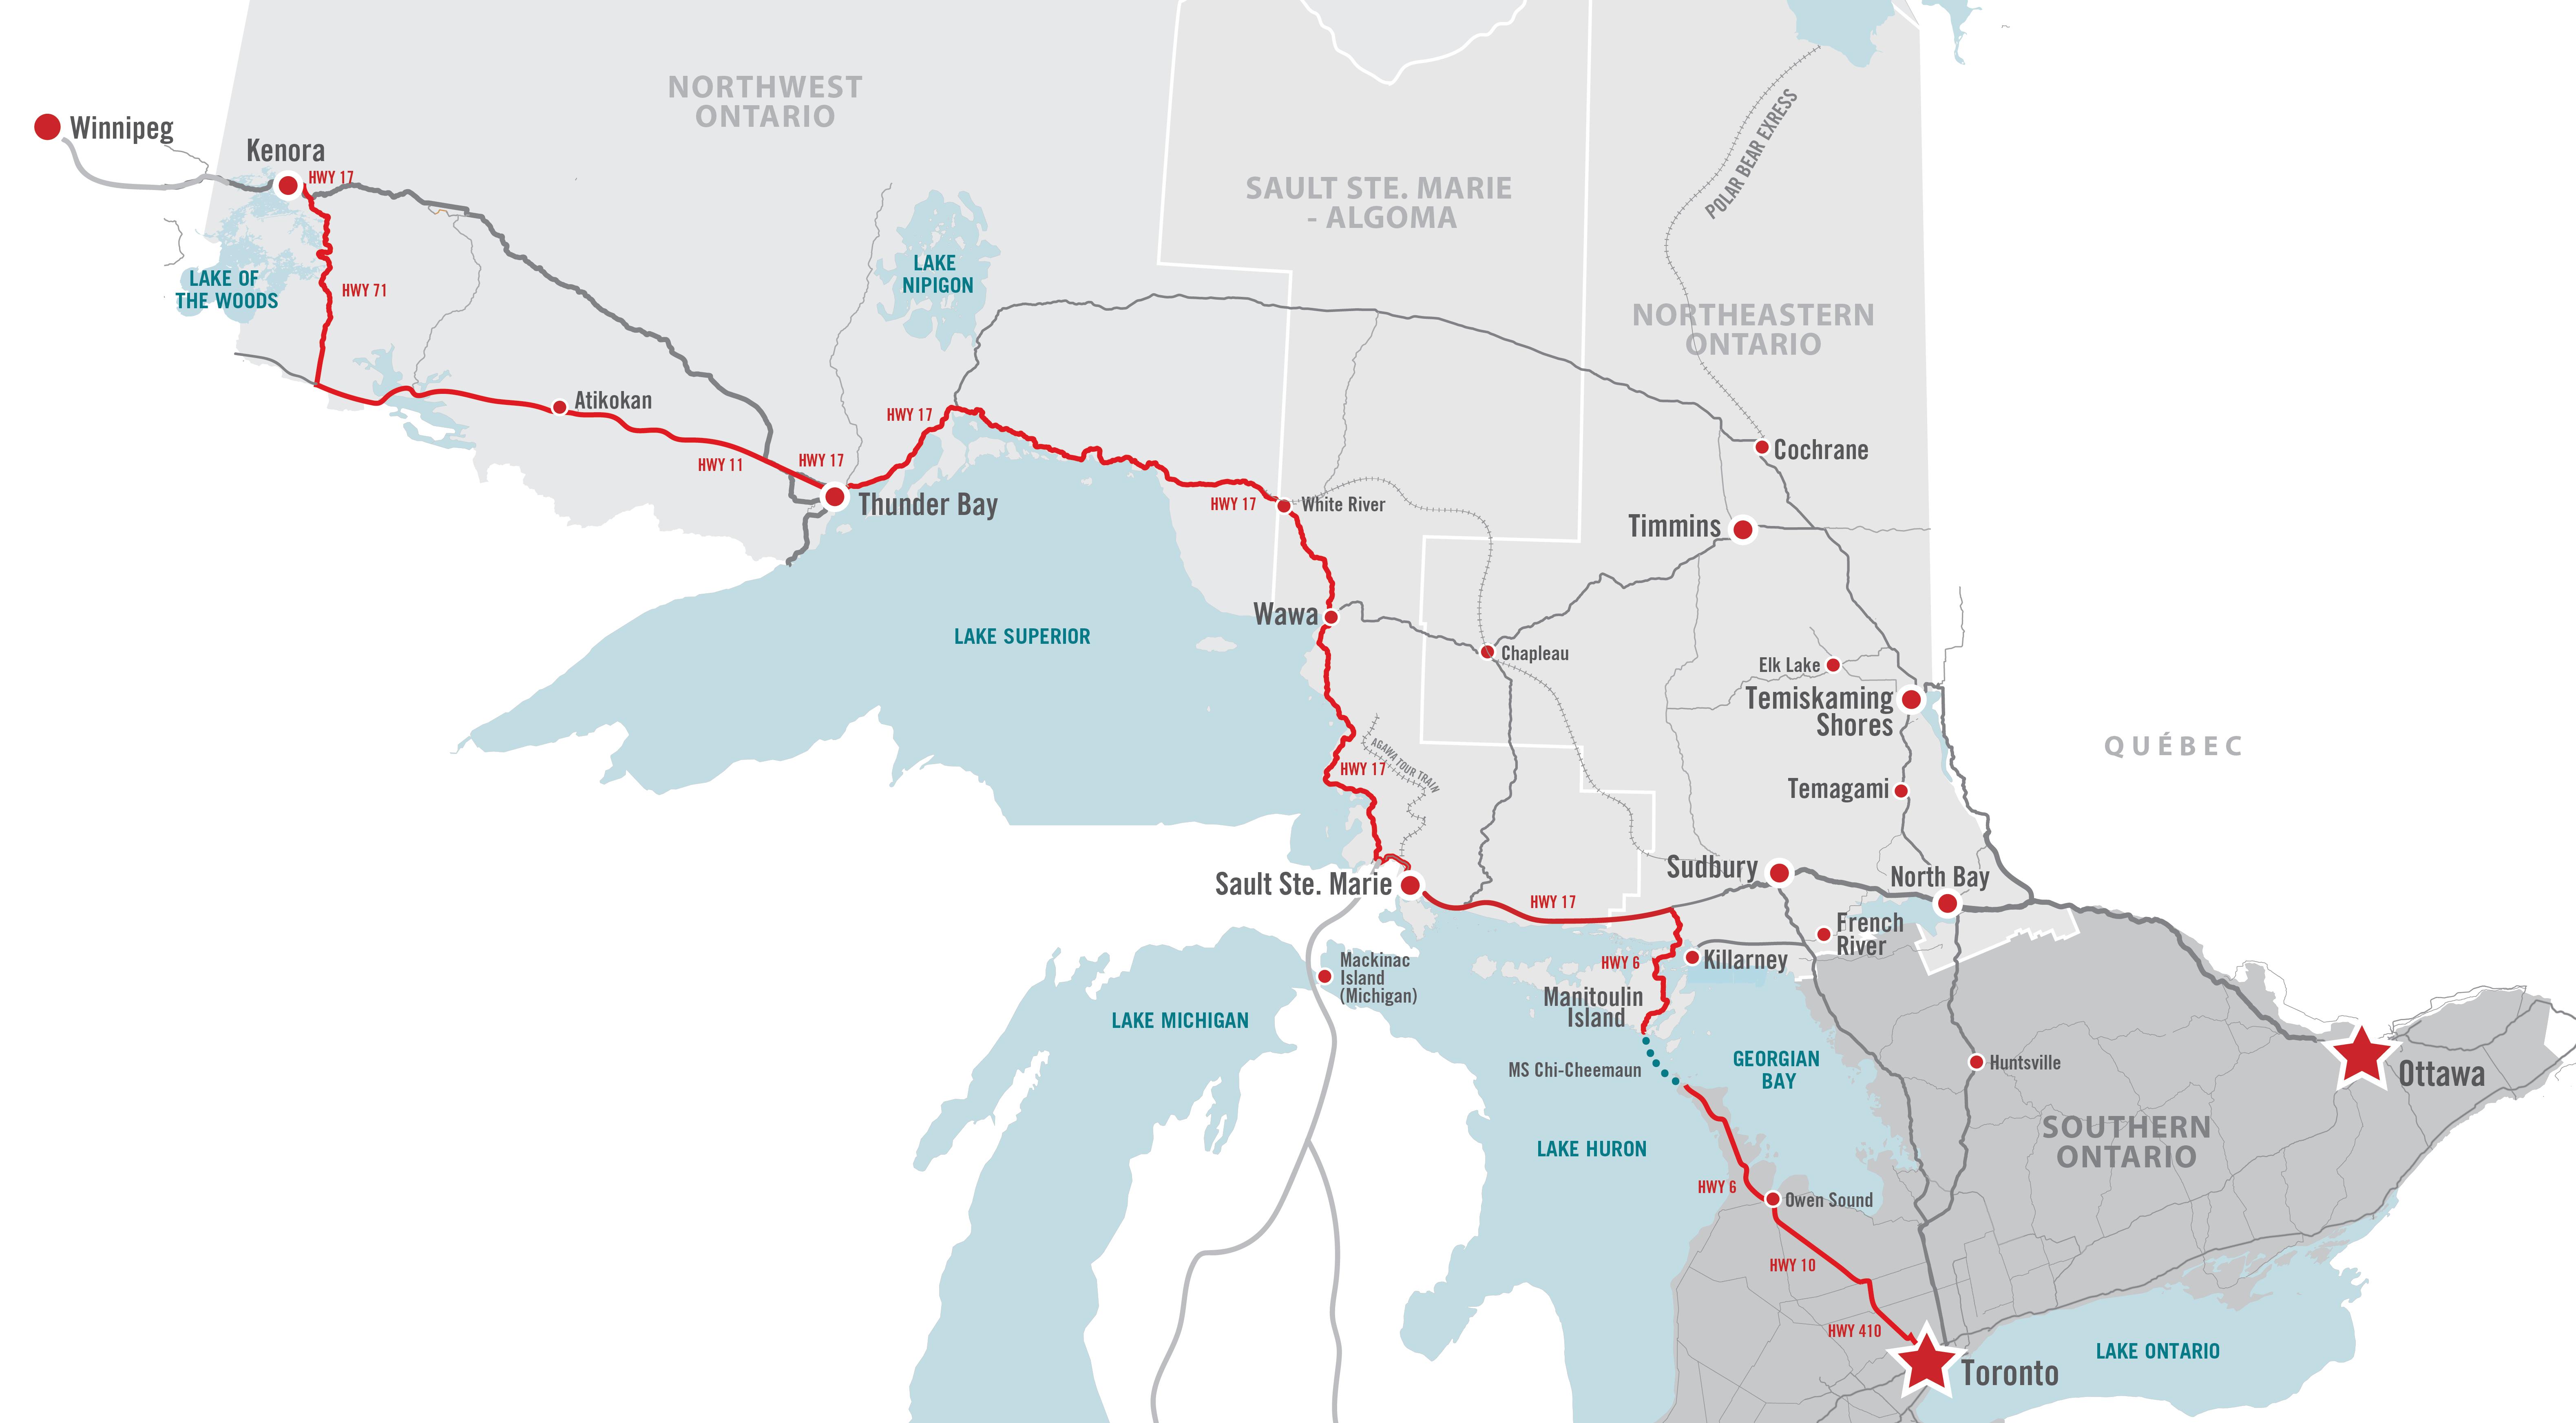 LakeSuperiorRoute_Ontario copy 4_Ontario copy 4